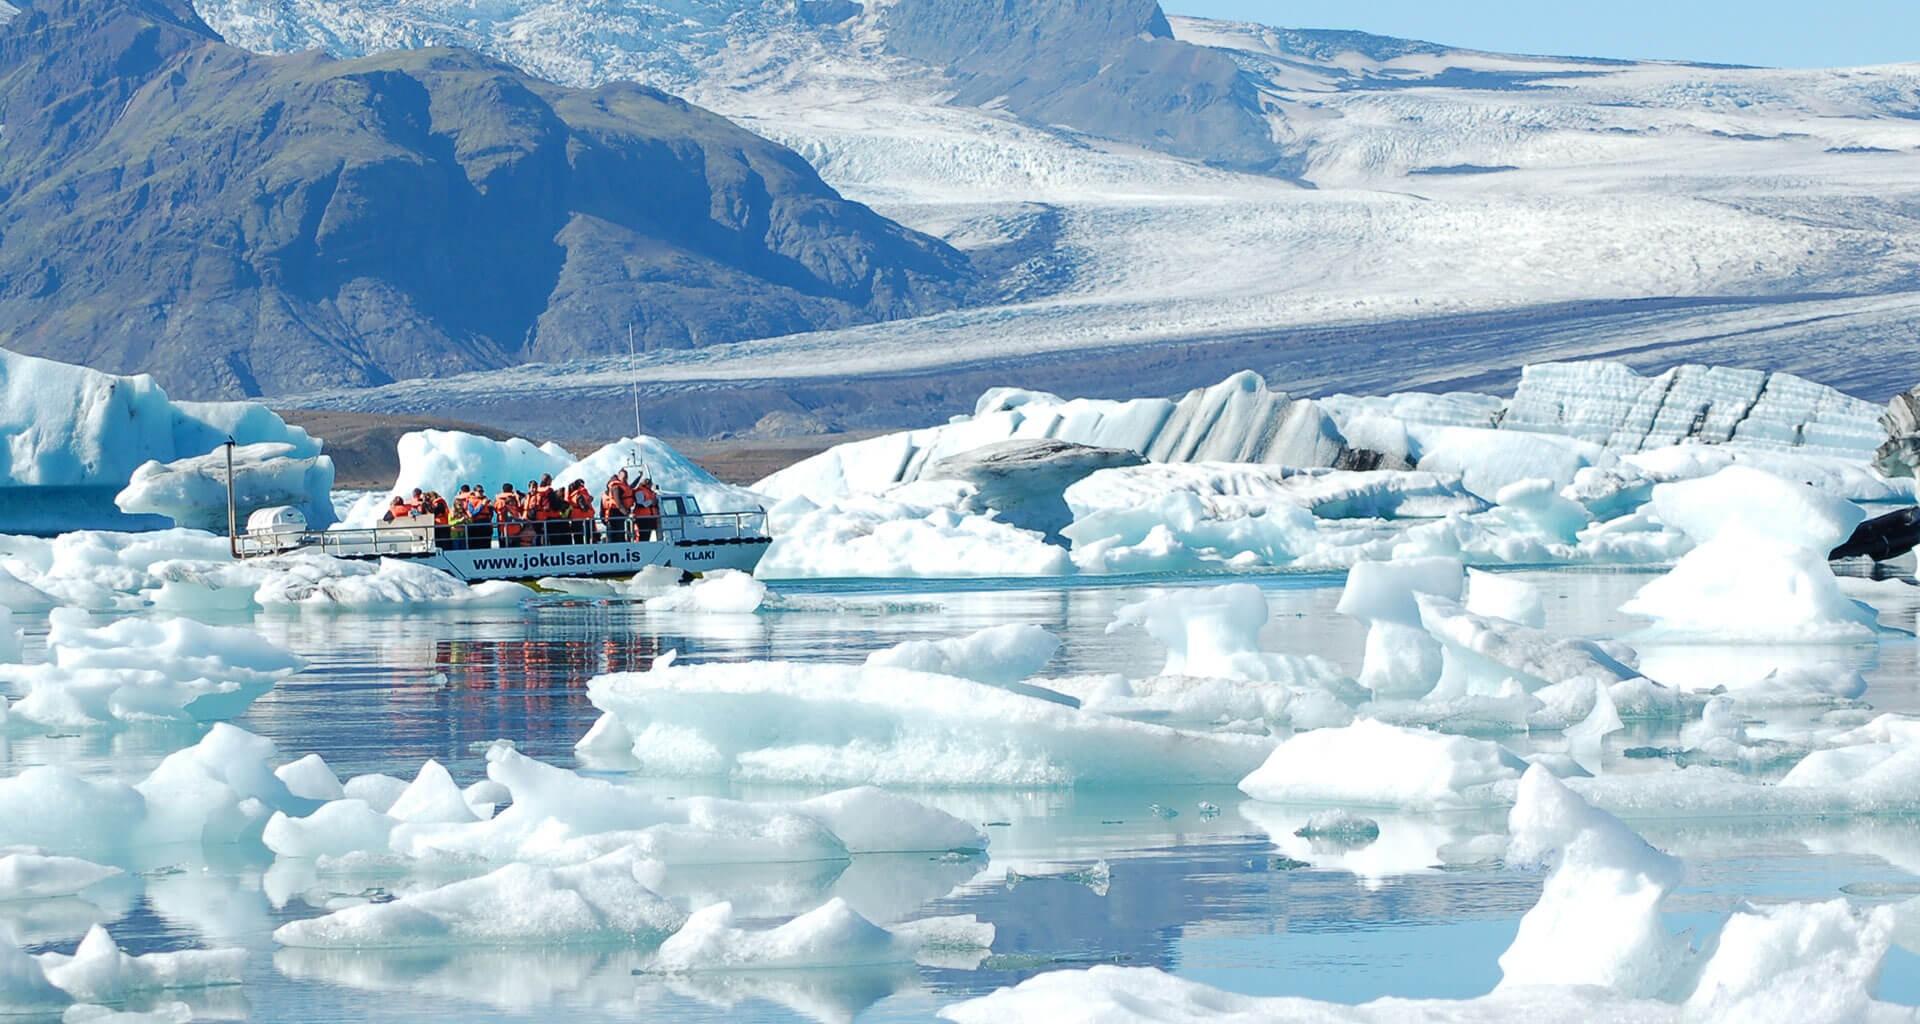 Jokulsarlon Amphibian Boat Tour Guide To Iceland